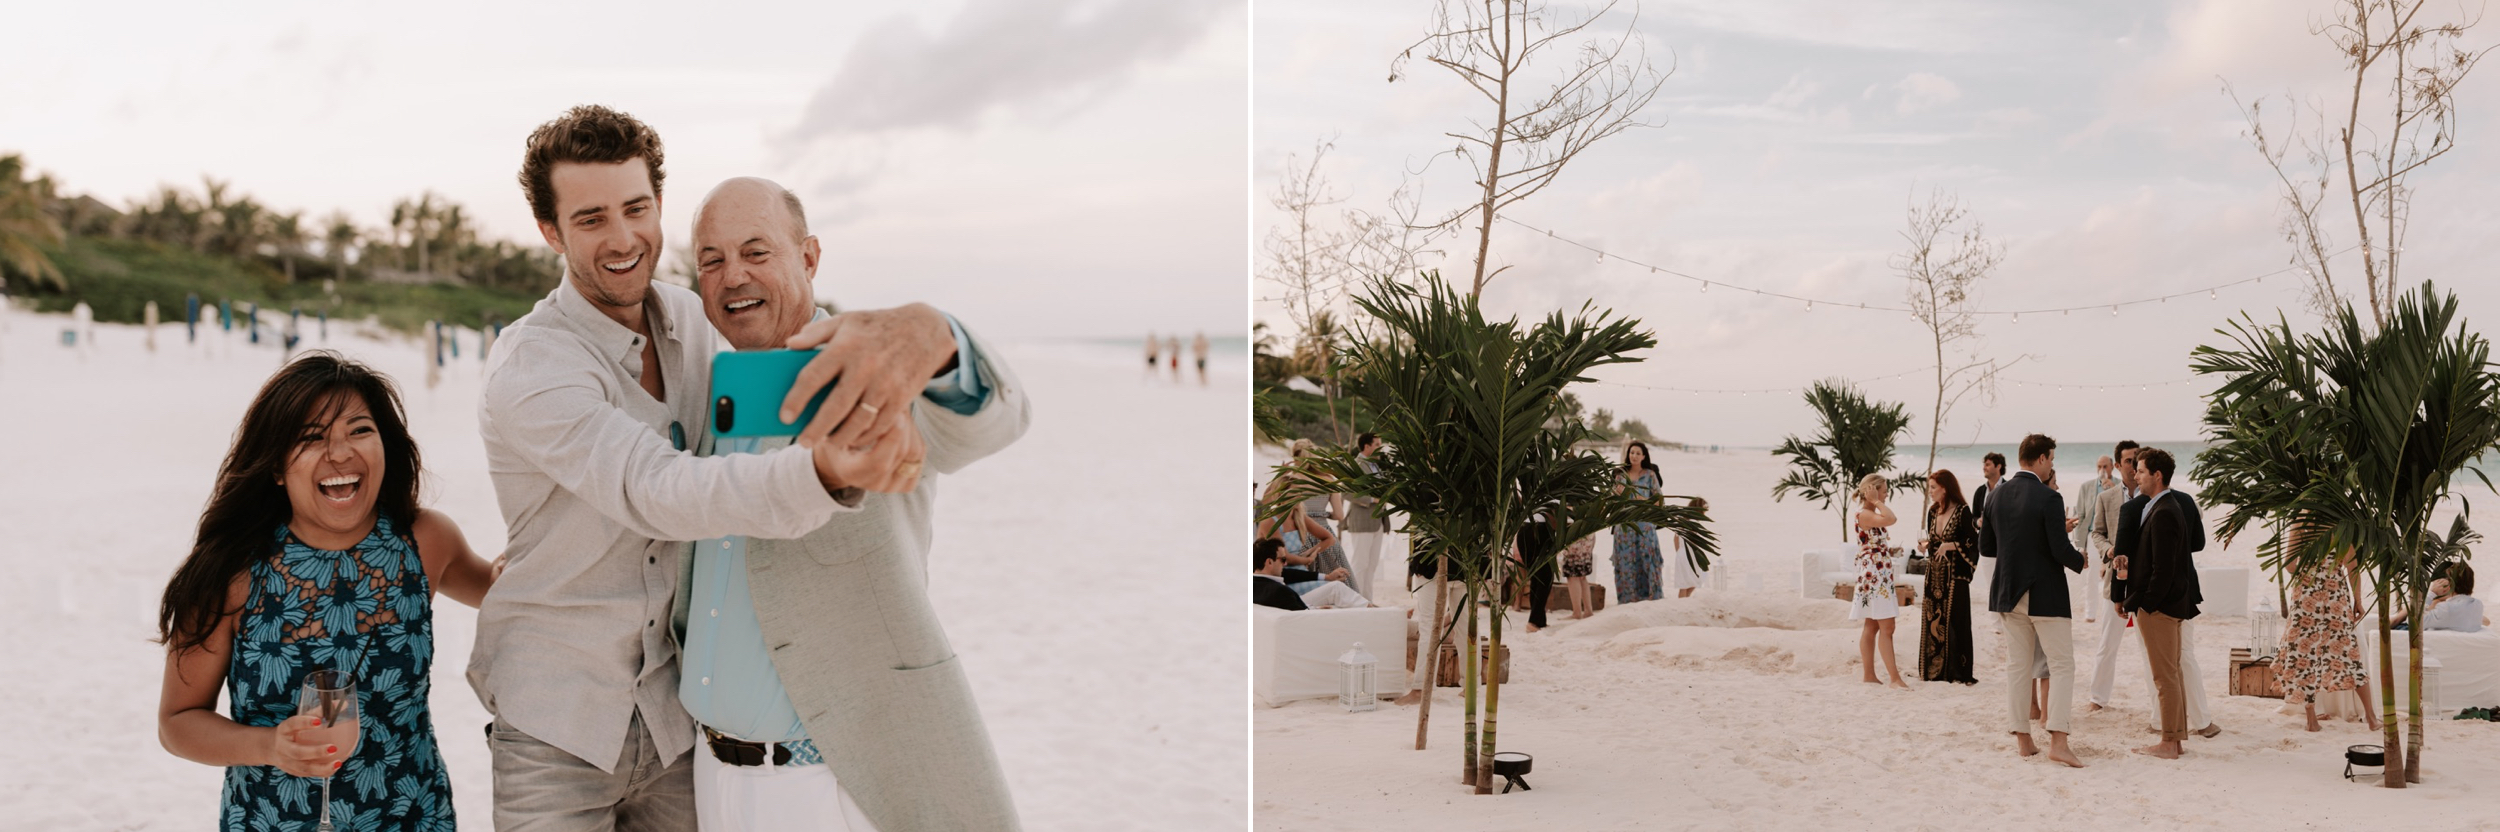 Harbour-Island-Ocean-View-Club-Wedding-Photographer_70.jpg